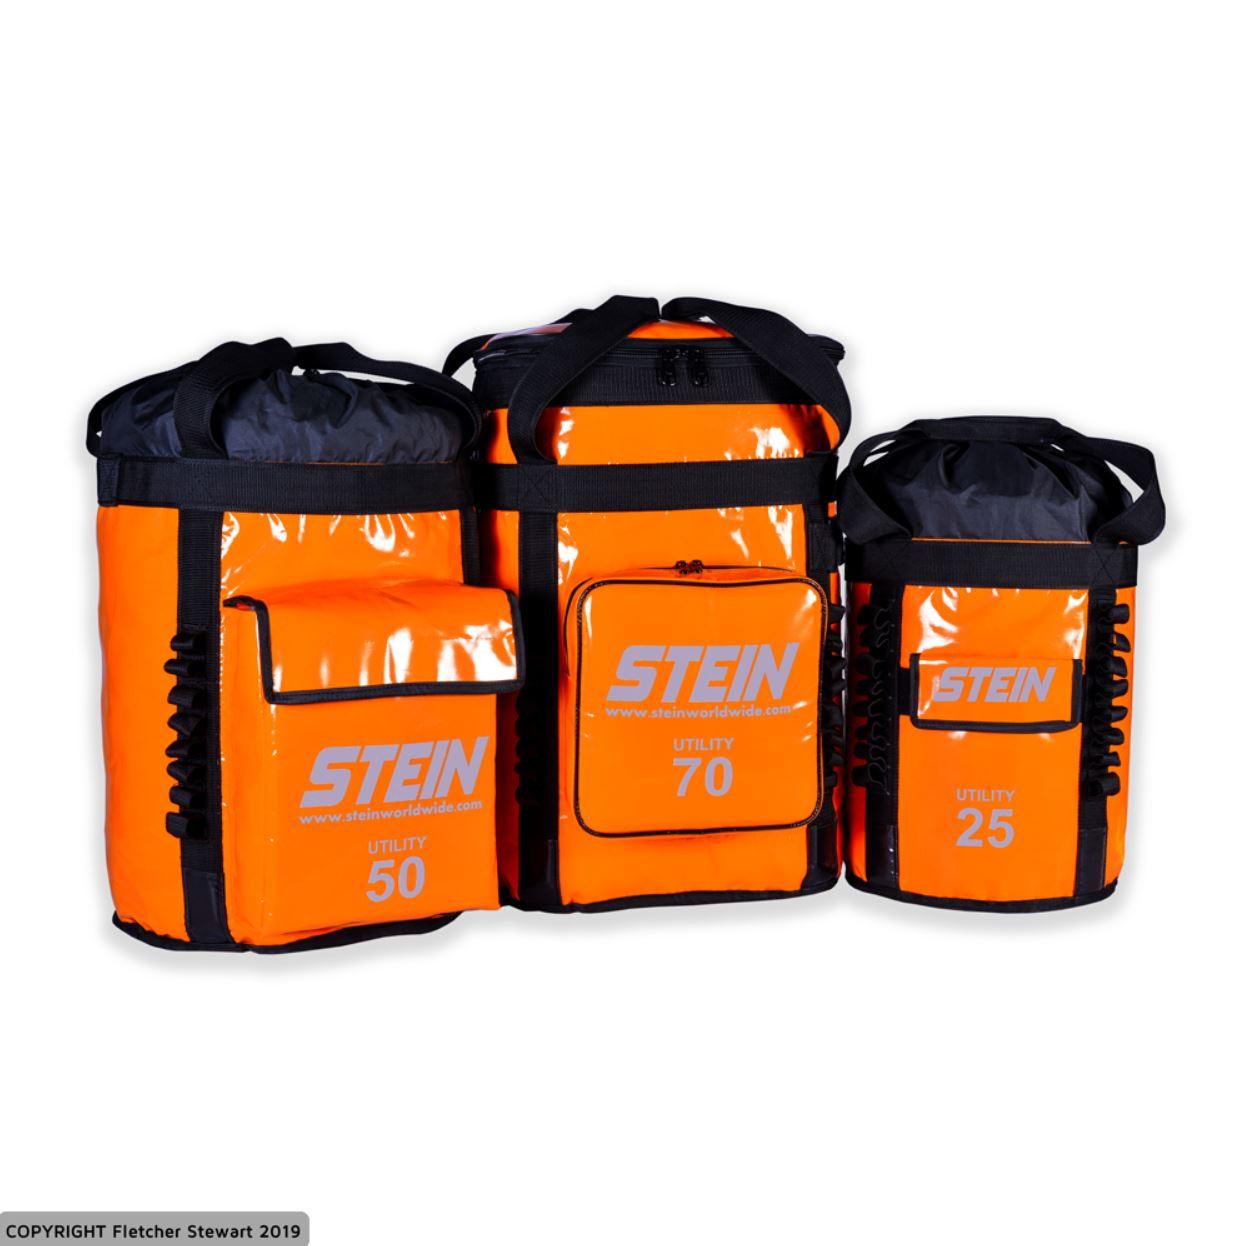 Stein UTILITY Kit Storage Bag